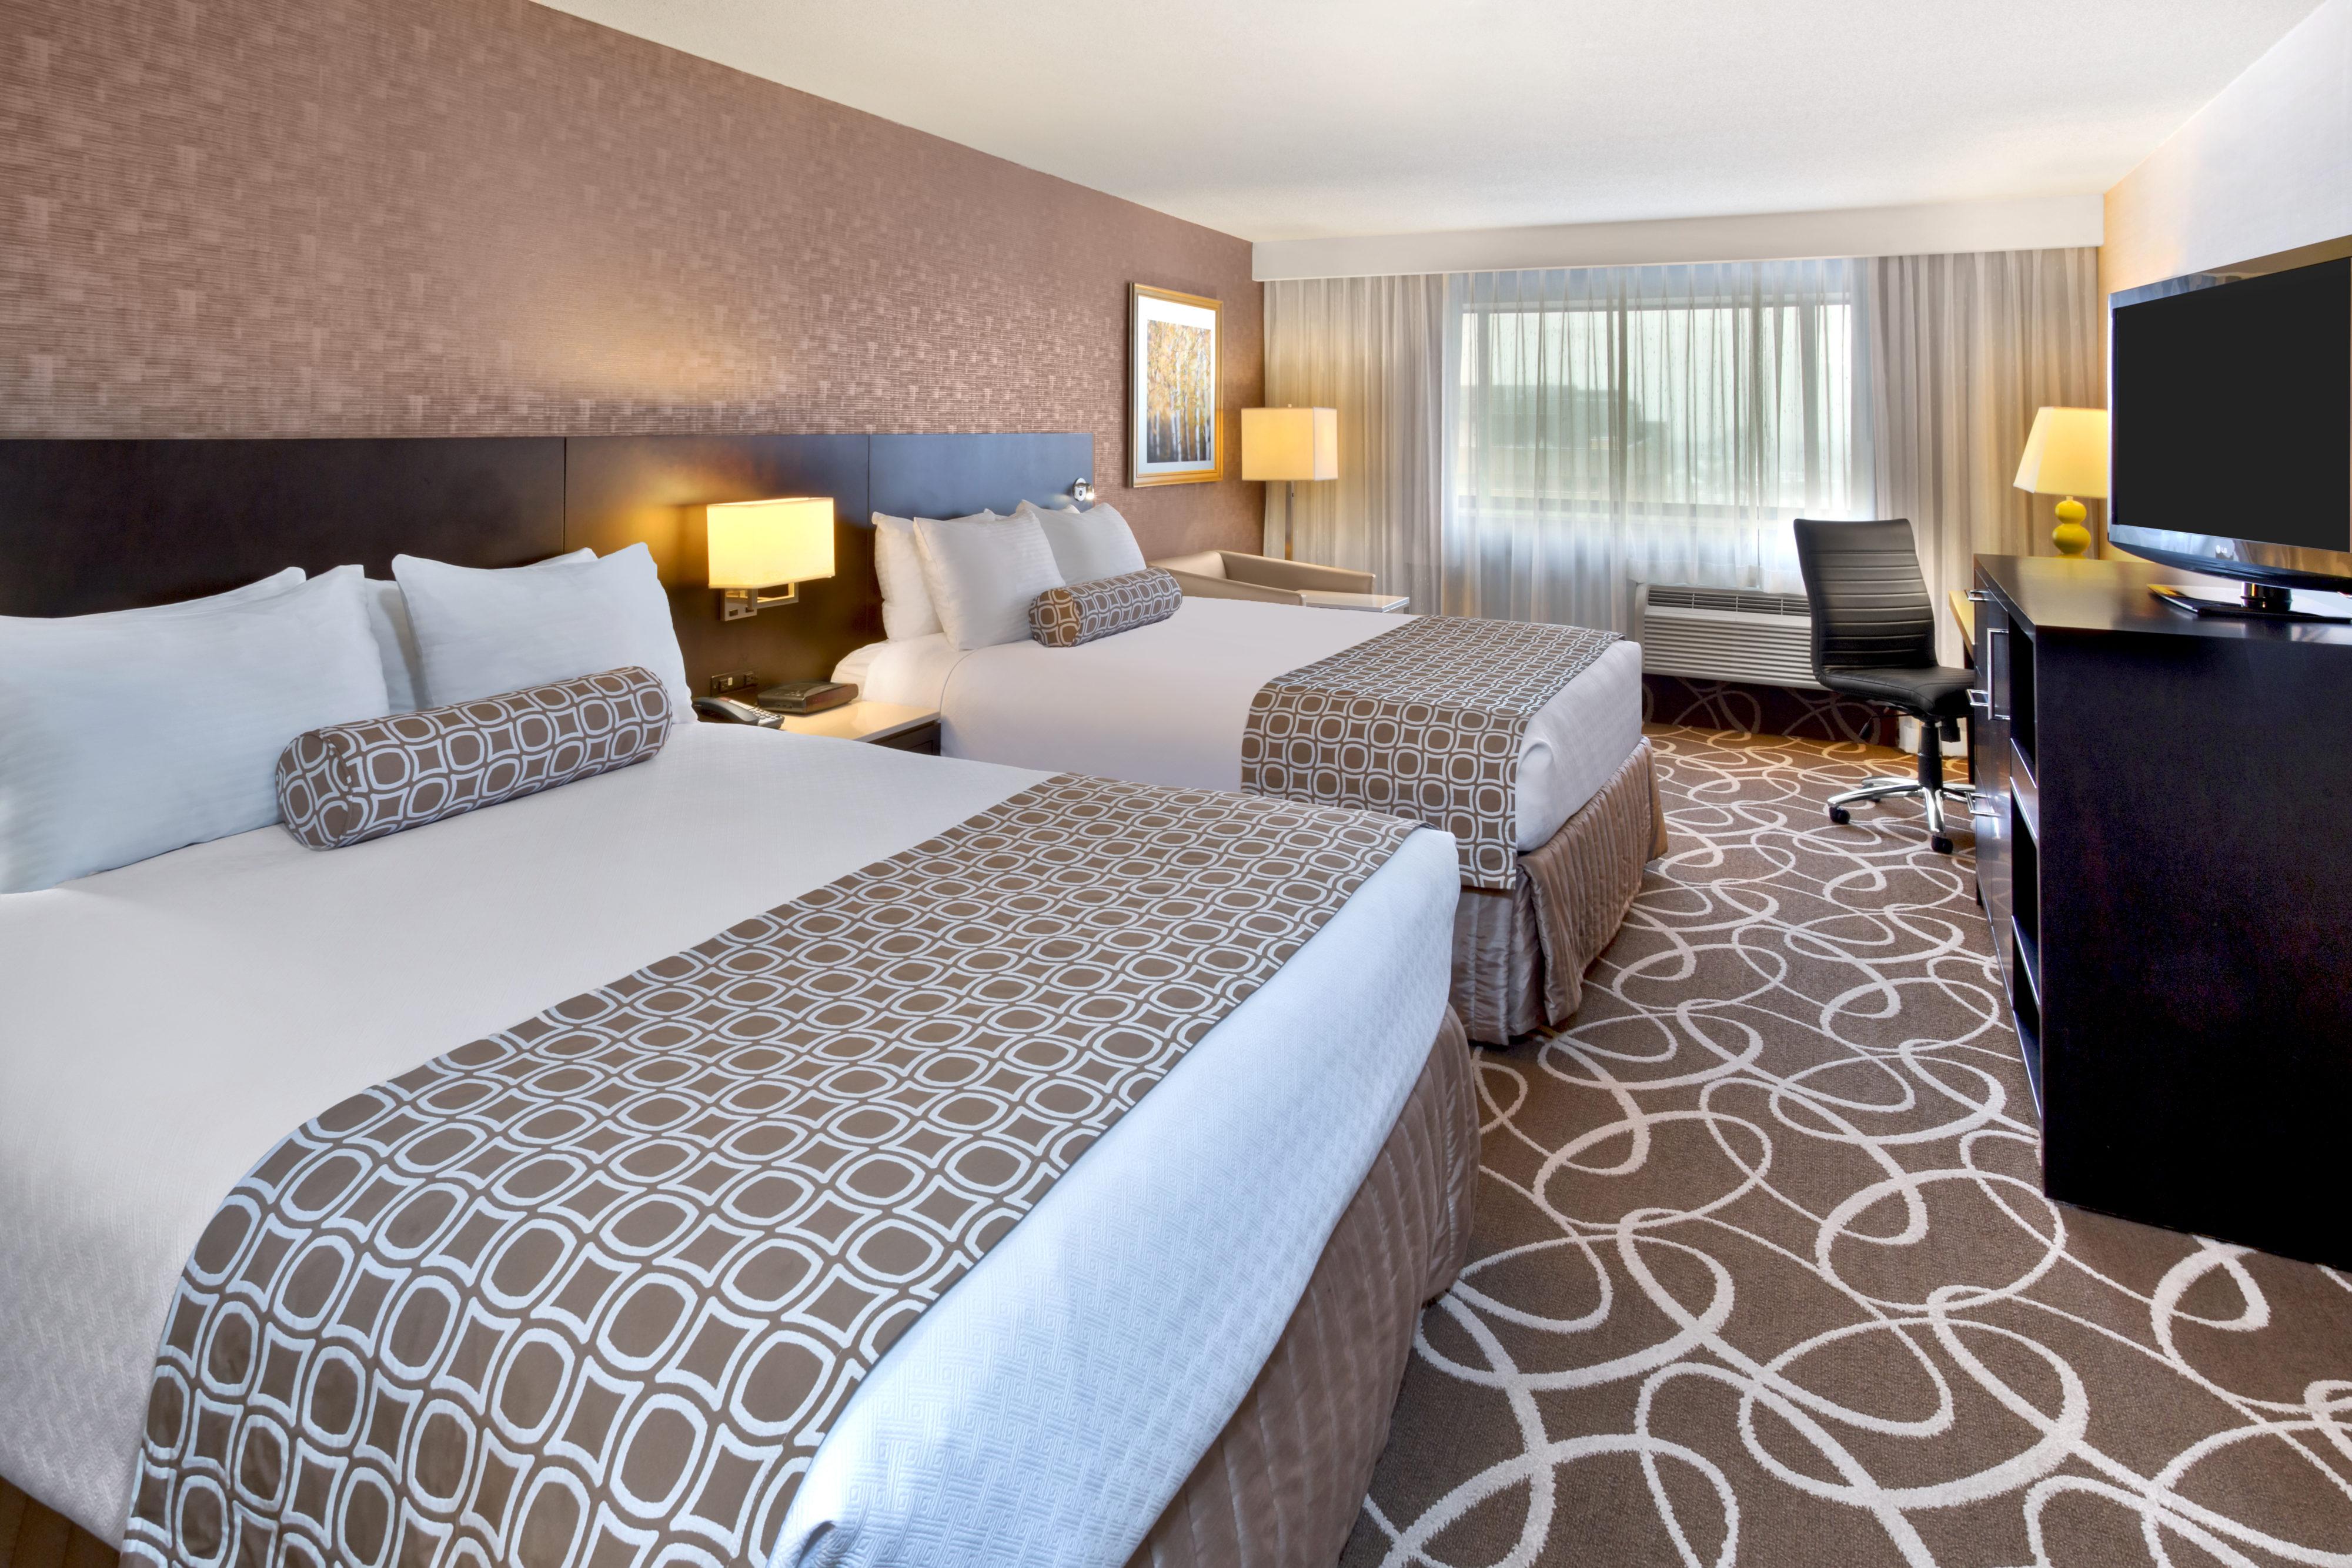 Crowne Plaza Kitchener rooms